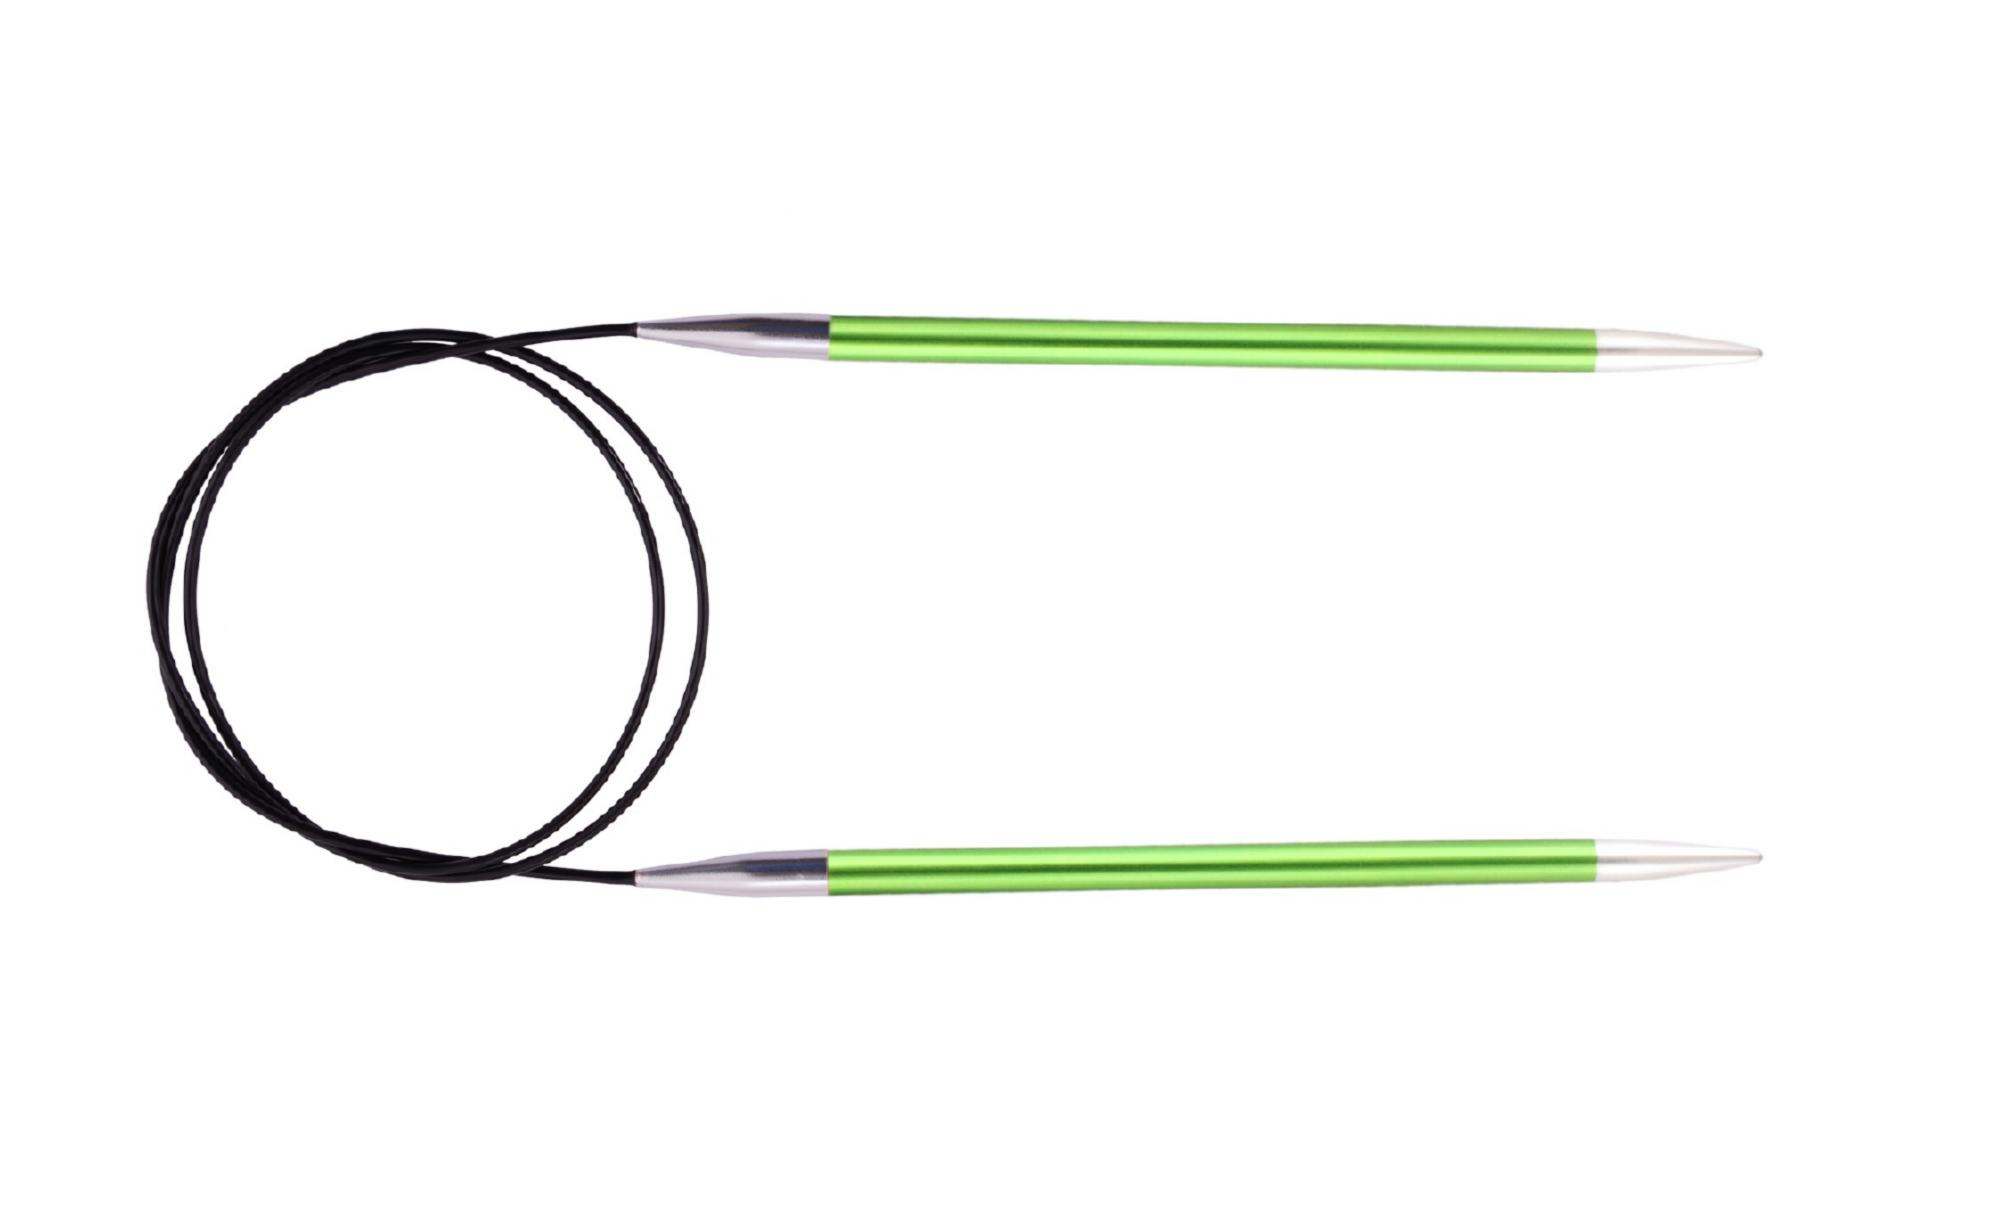 Спицы круговые 150 см Zing KnitPro, 47207, 3.50 мм